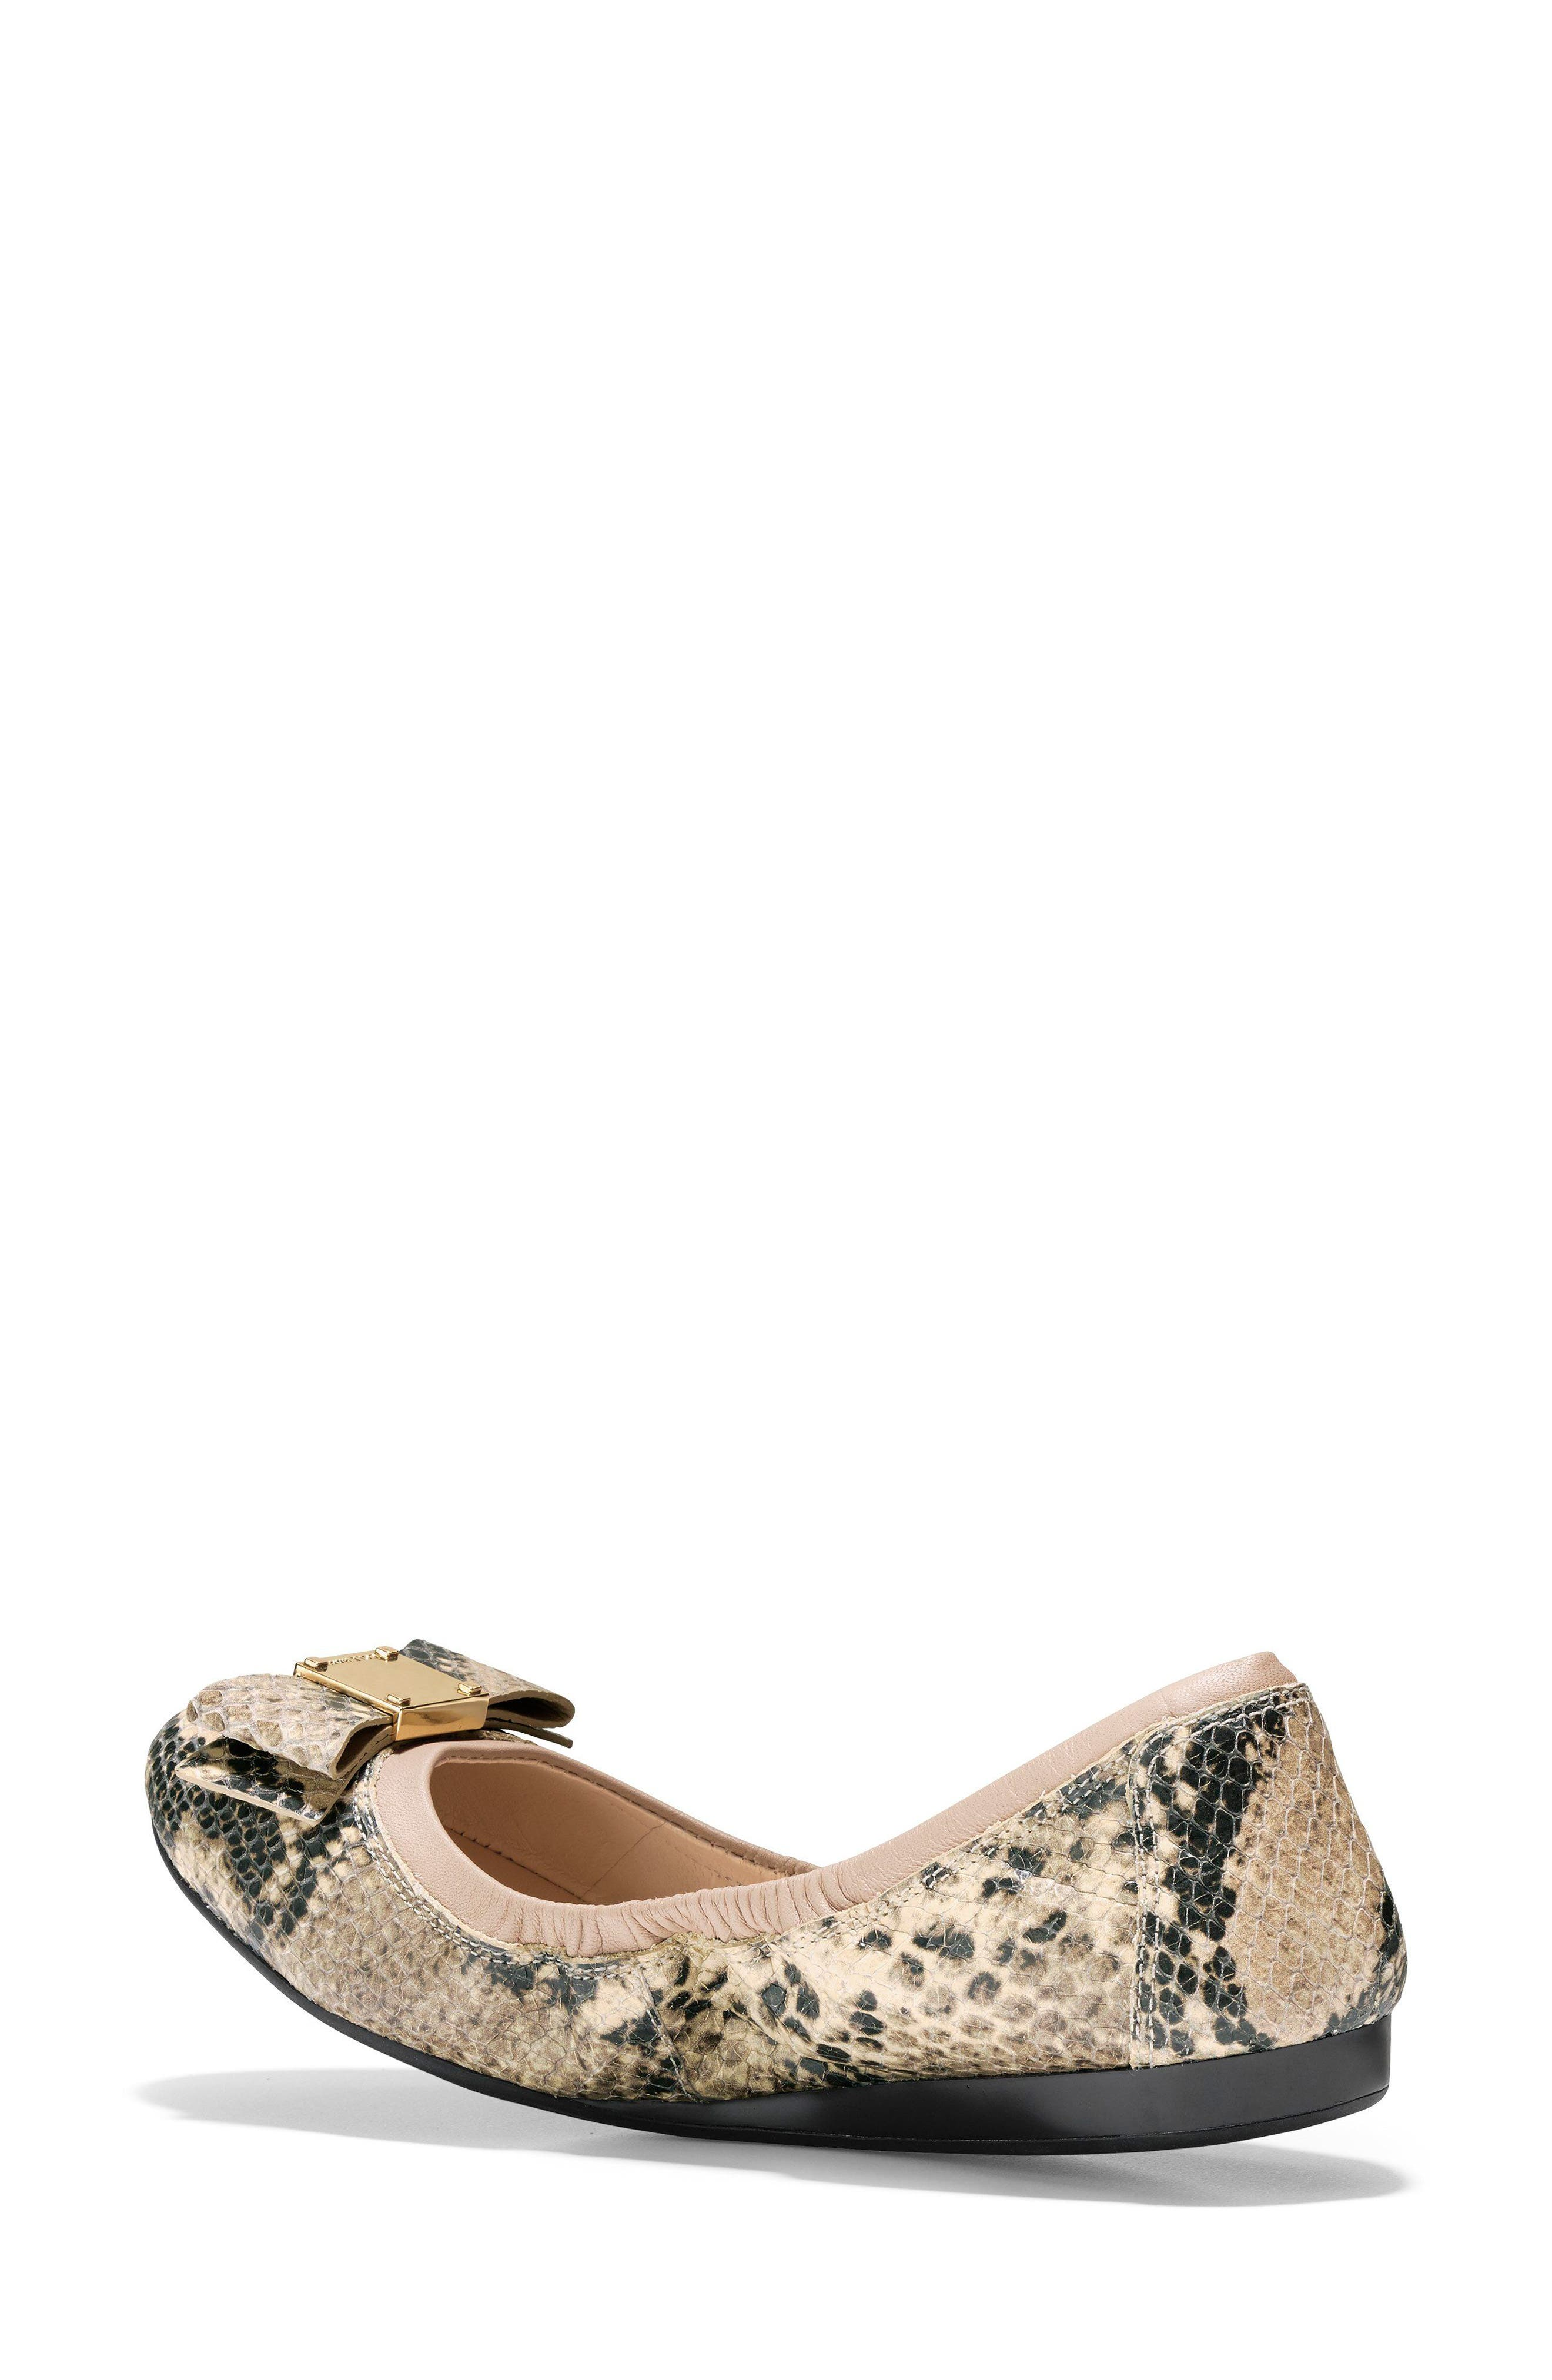 'Tali' Bow Ballet Flat,                             Alternate thumbnail 2, color,                             Roccia Snake Print Leather